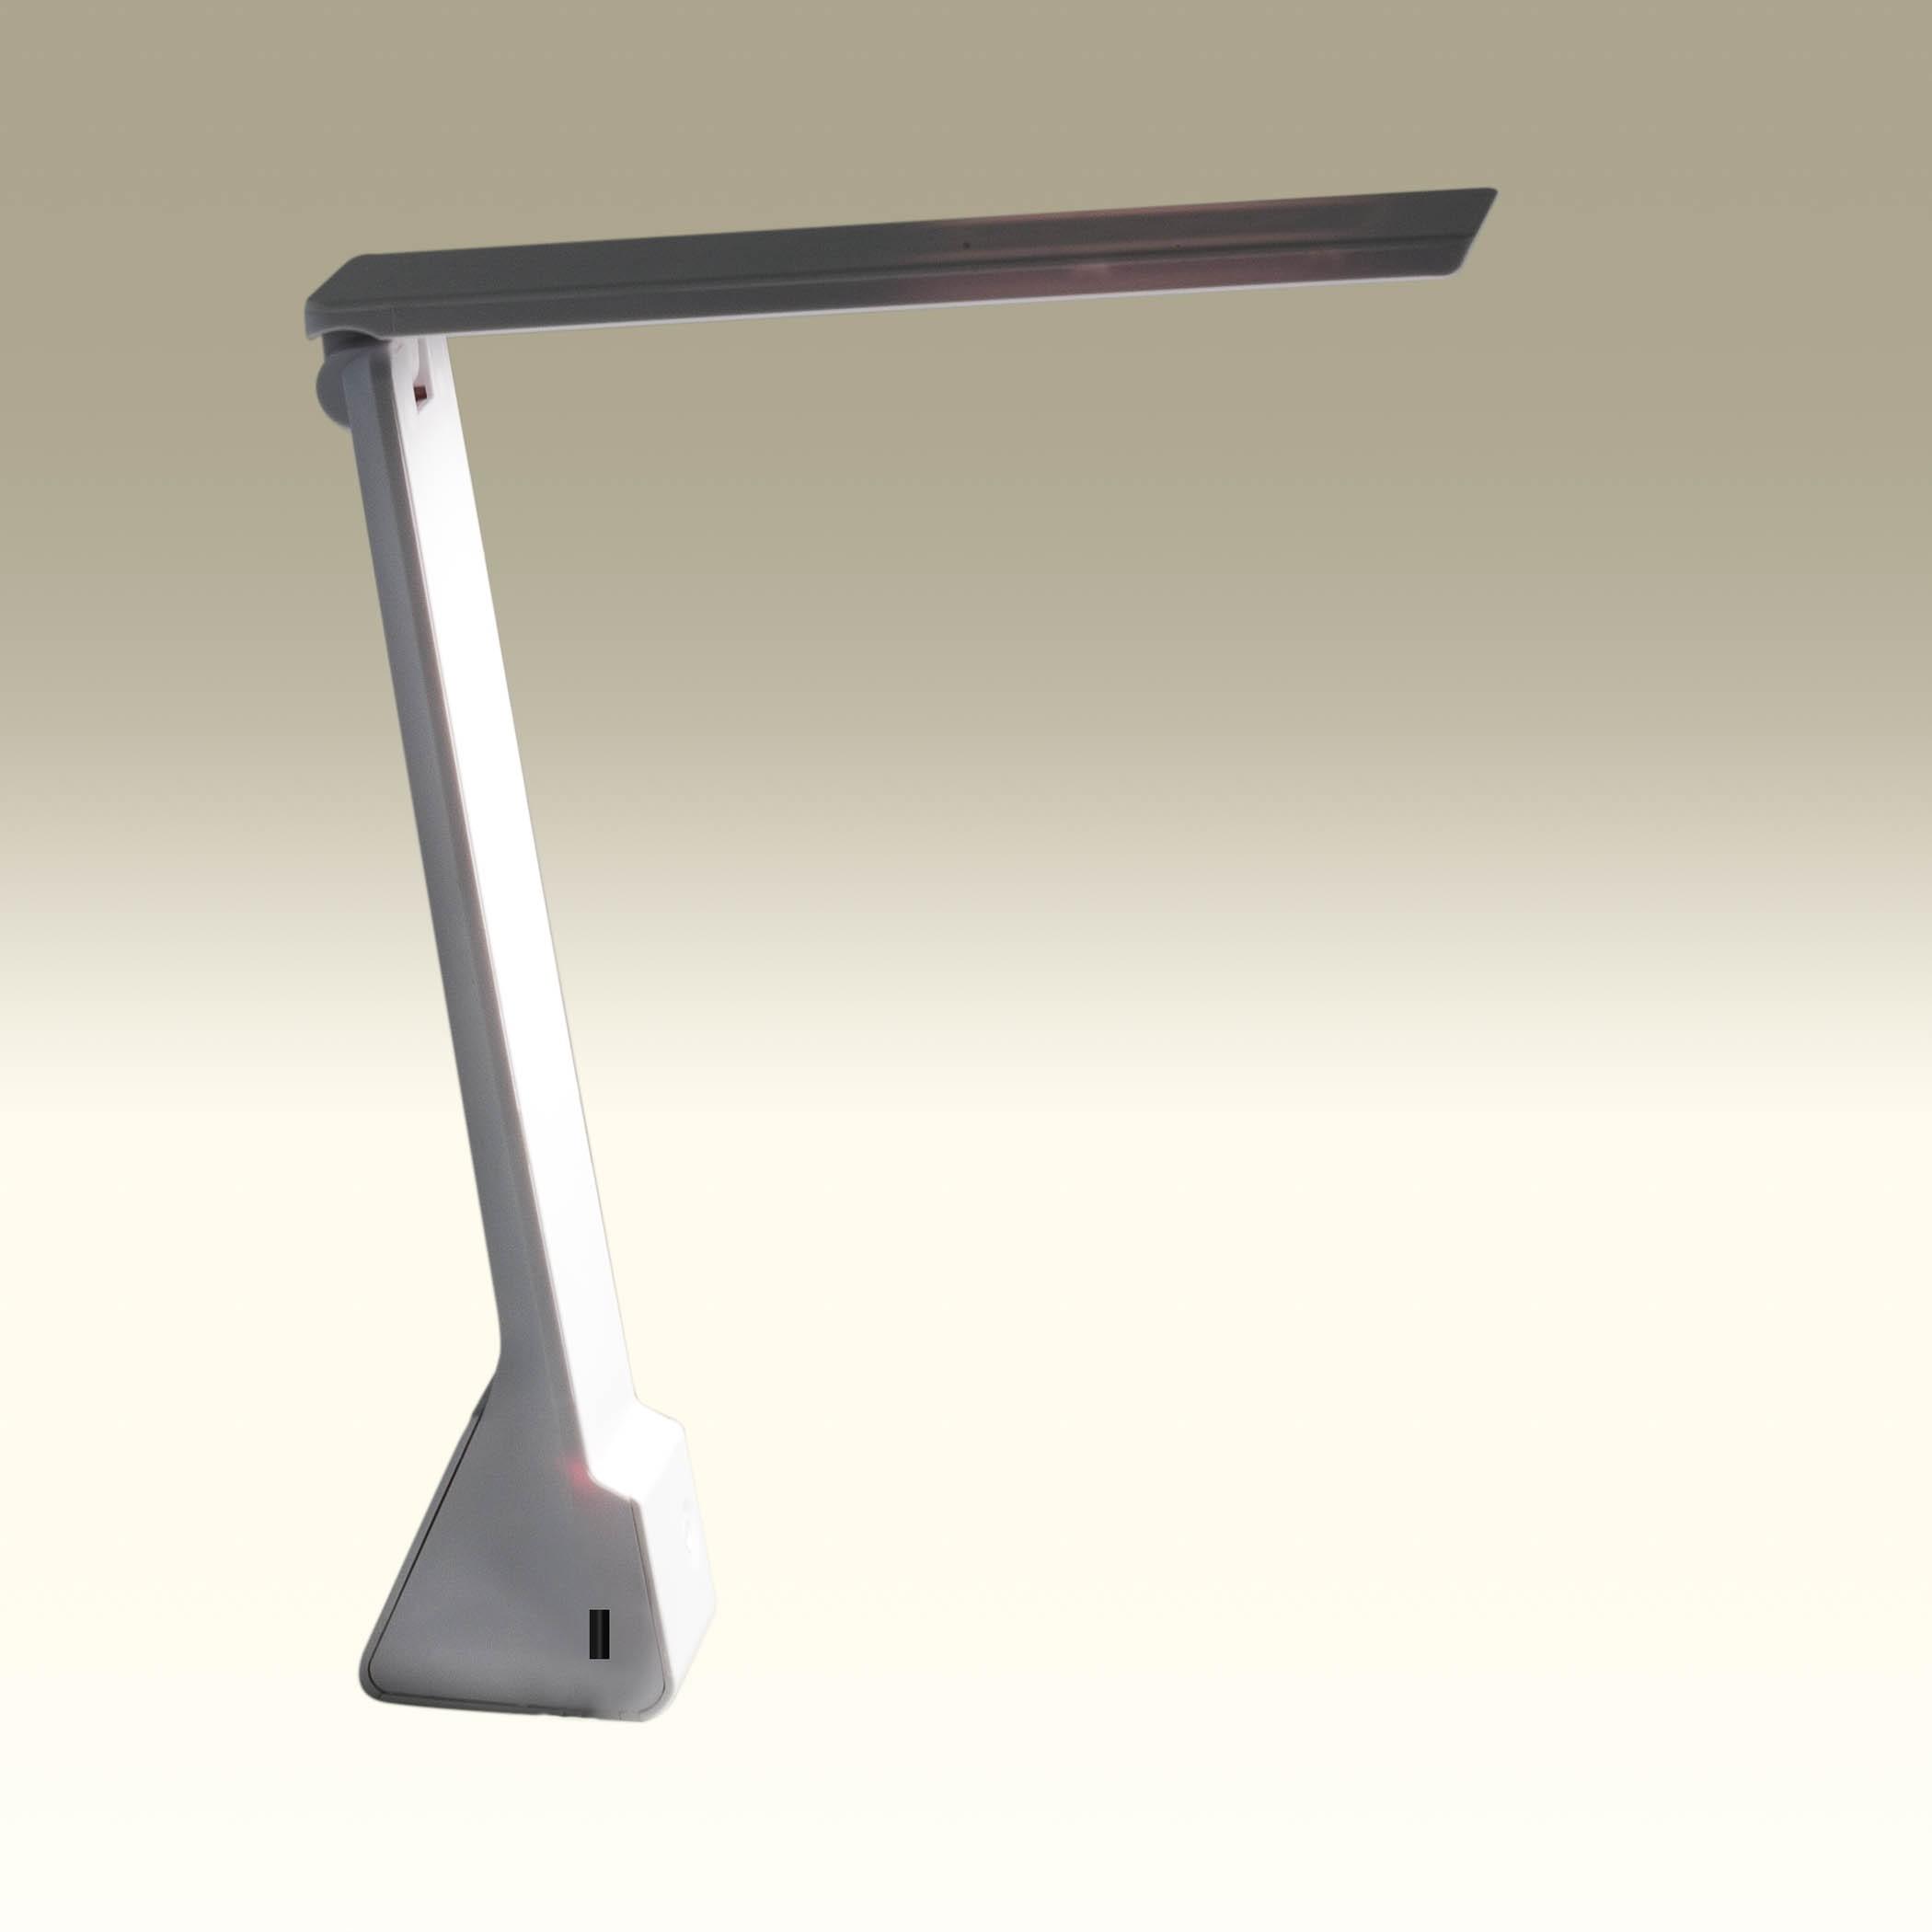 lamps signature metal by item products style design desk number ashley kylen vintage lamp